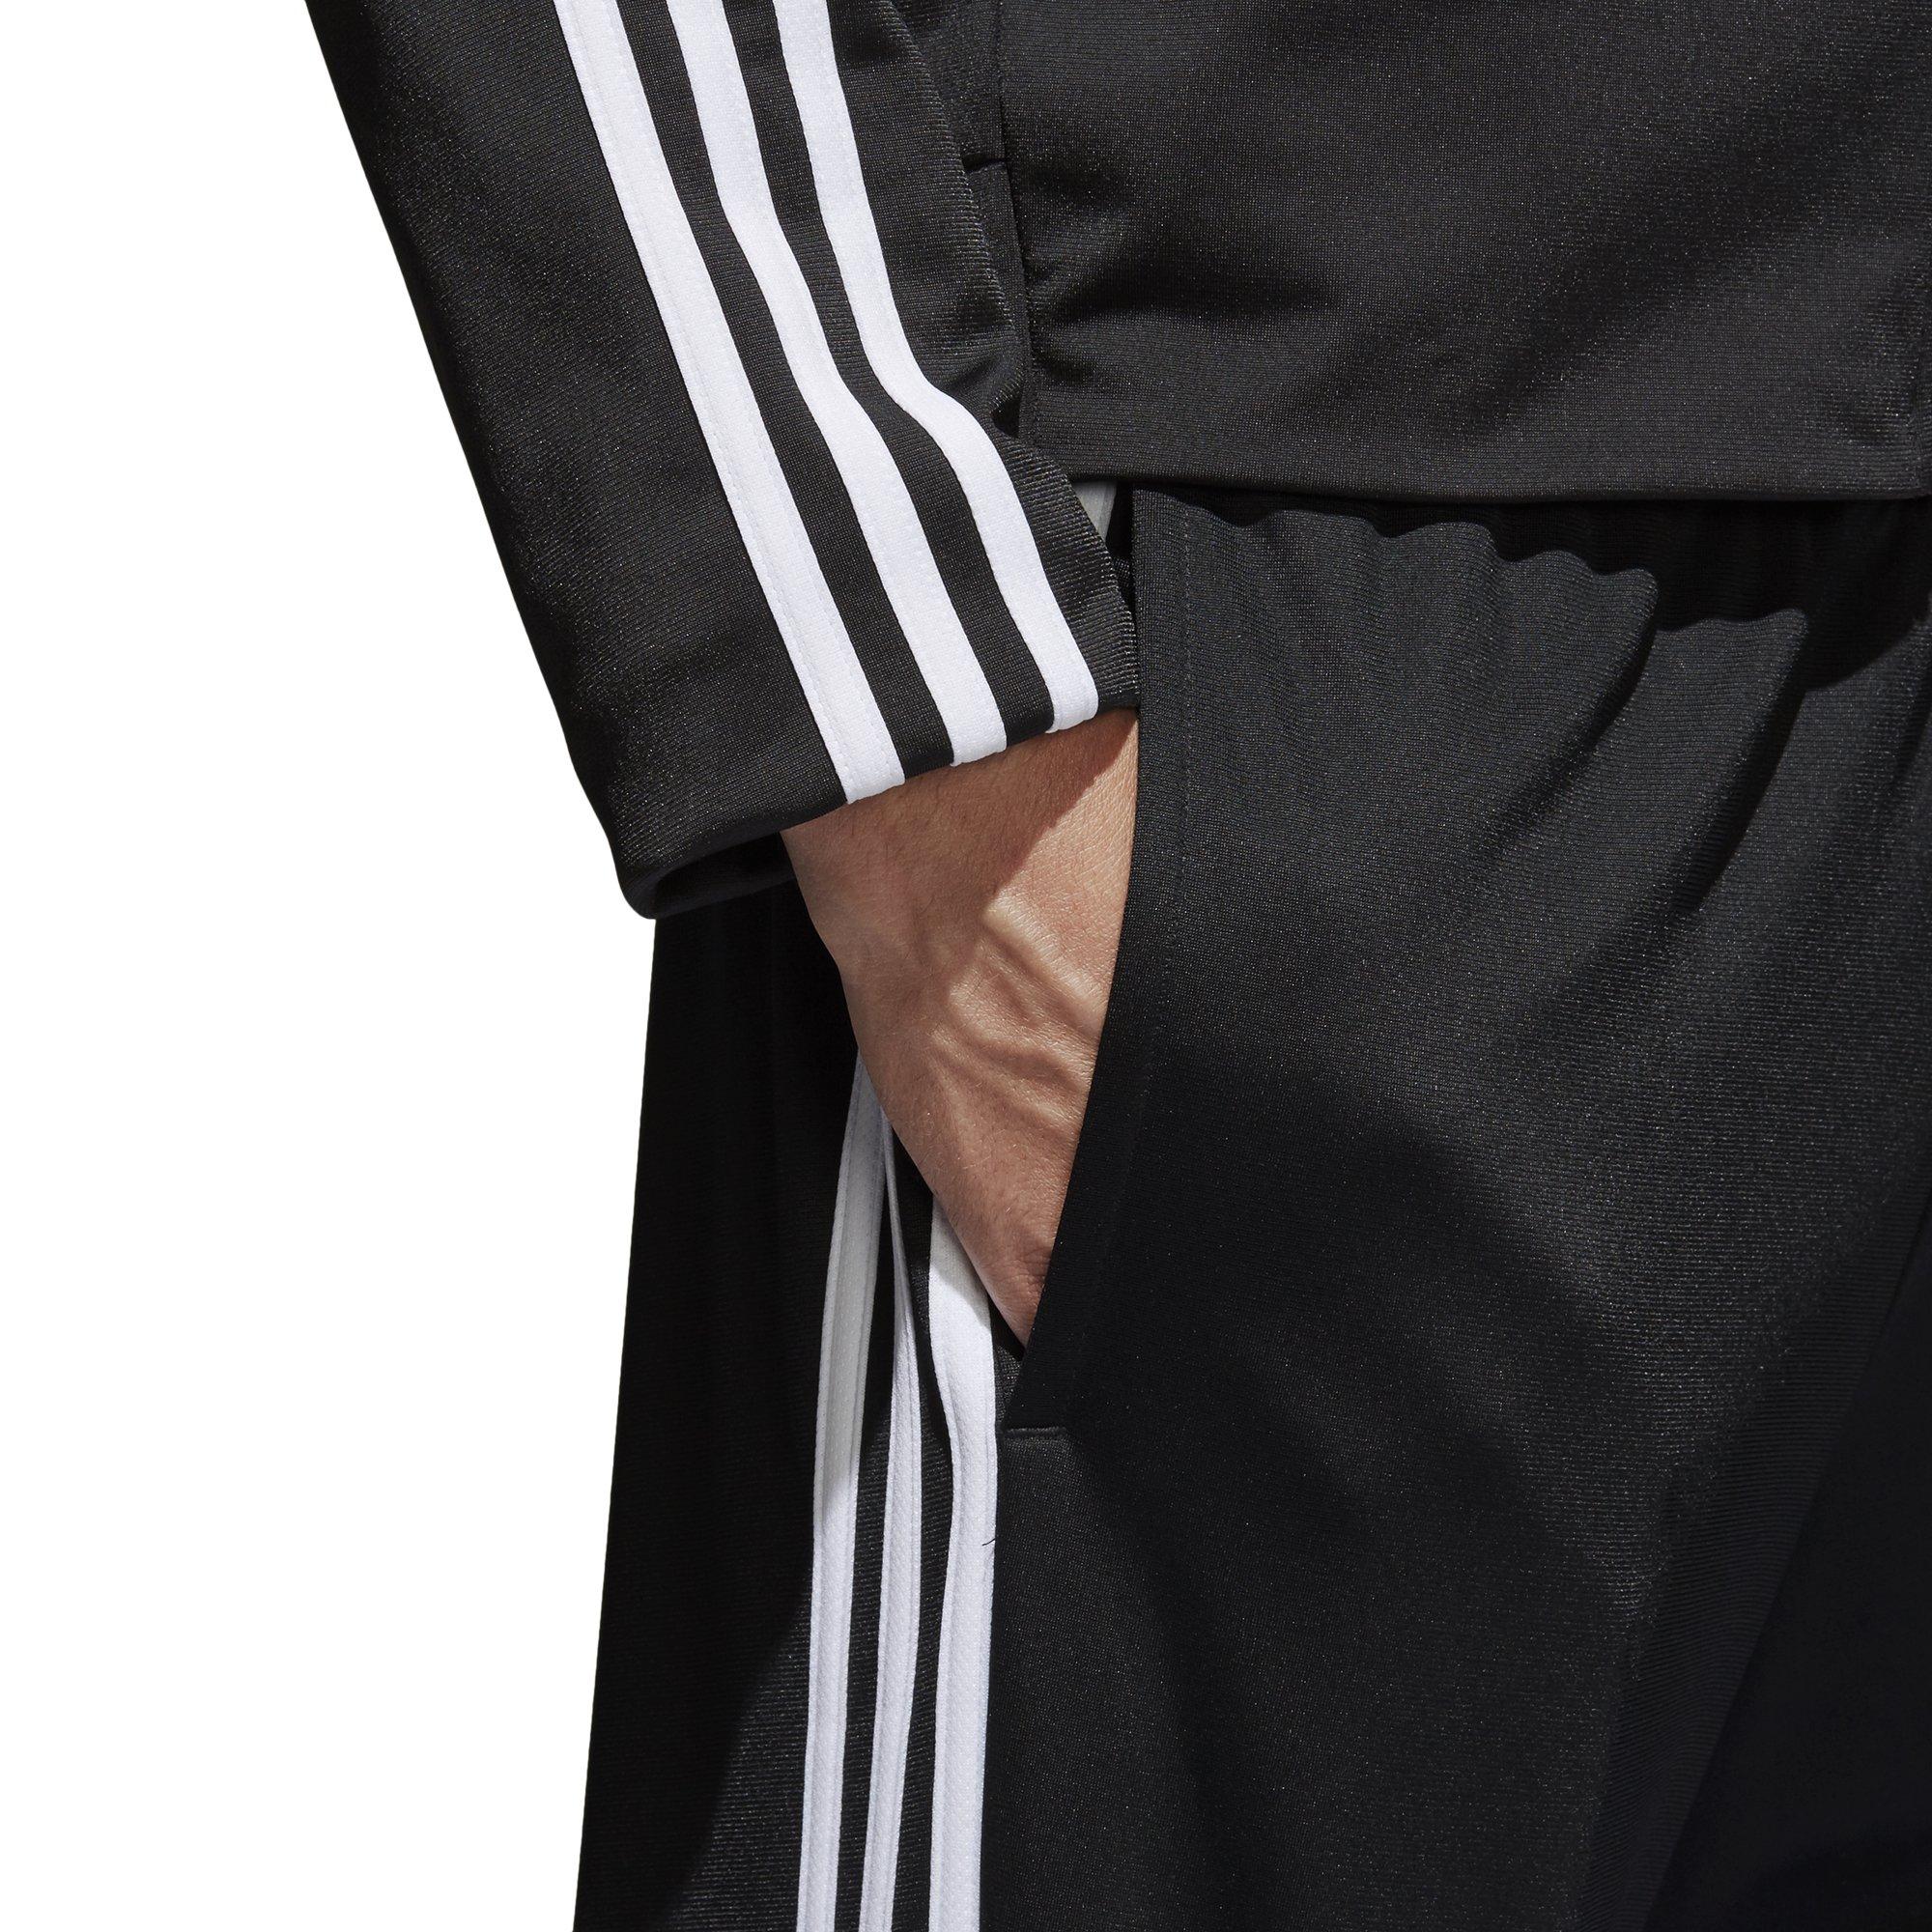 adidas Men's Athletics Essential Tricot 3-Stripe Pants, Black/White, Small by adidas (Image #6)